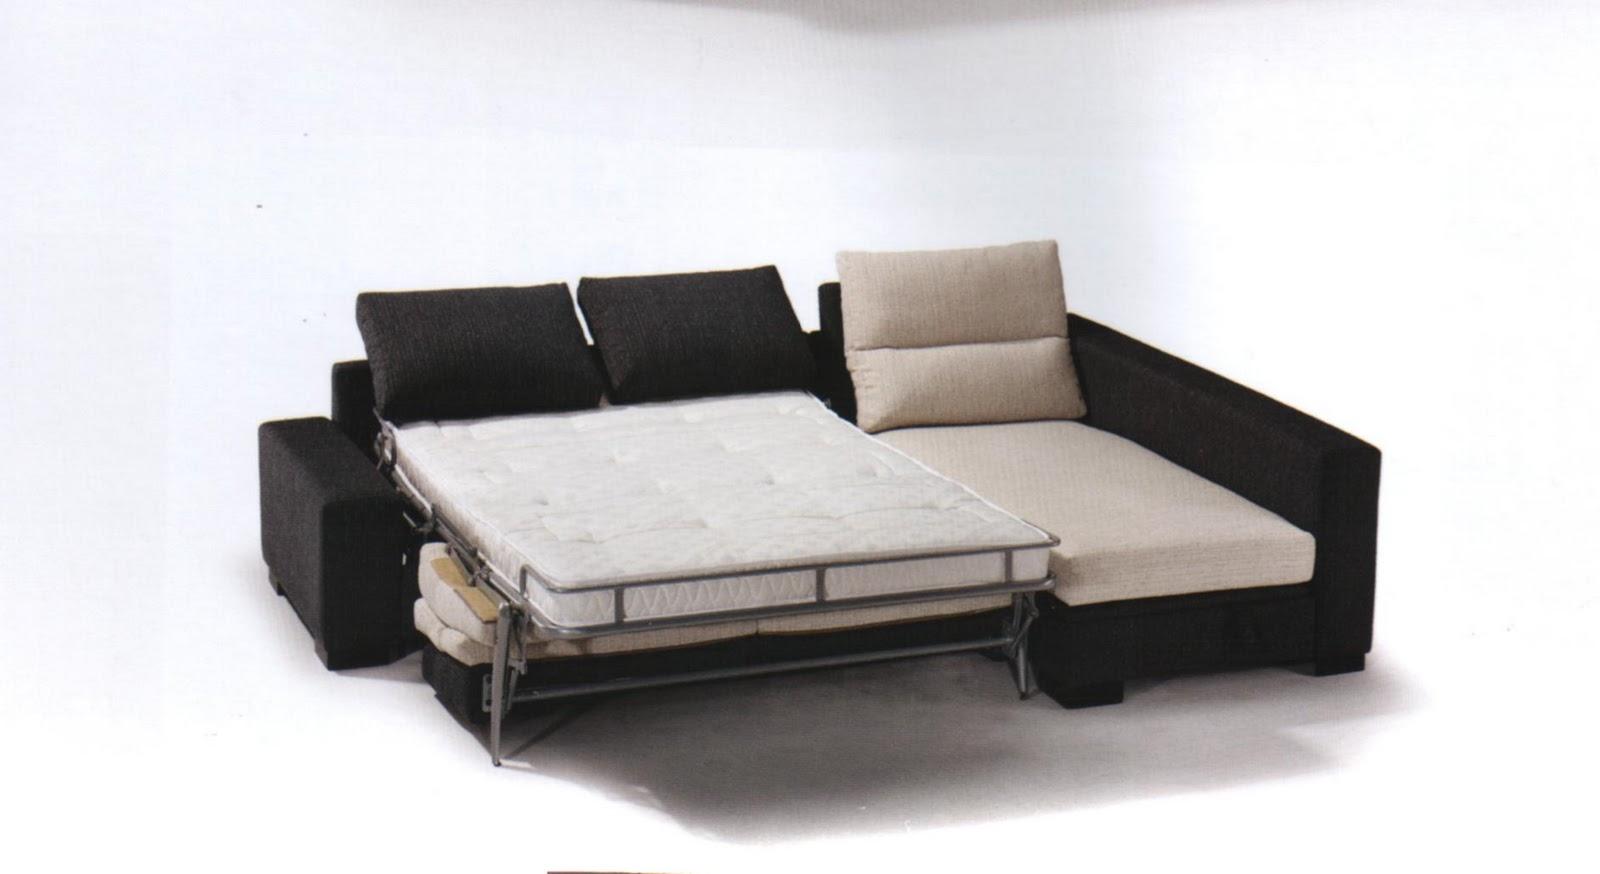 Muebles vilu convertible en cama - Muebles convertibles ...